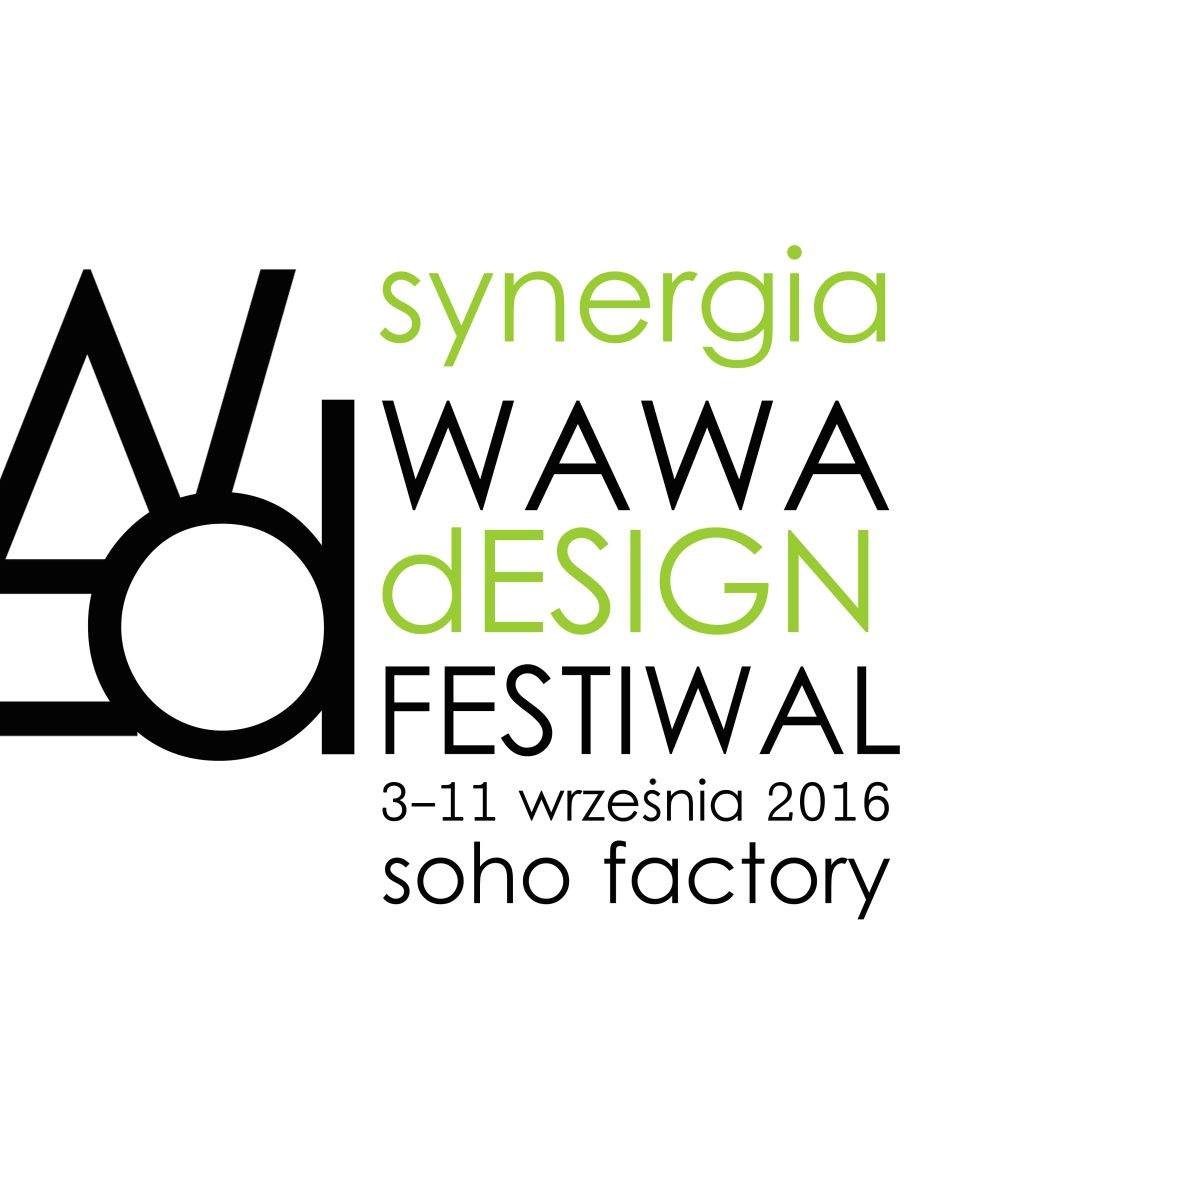 WAWA DESIGN FESTIWAL 04